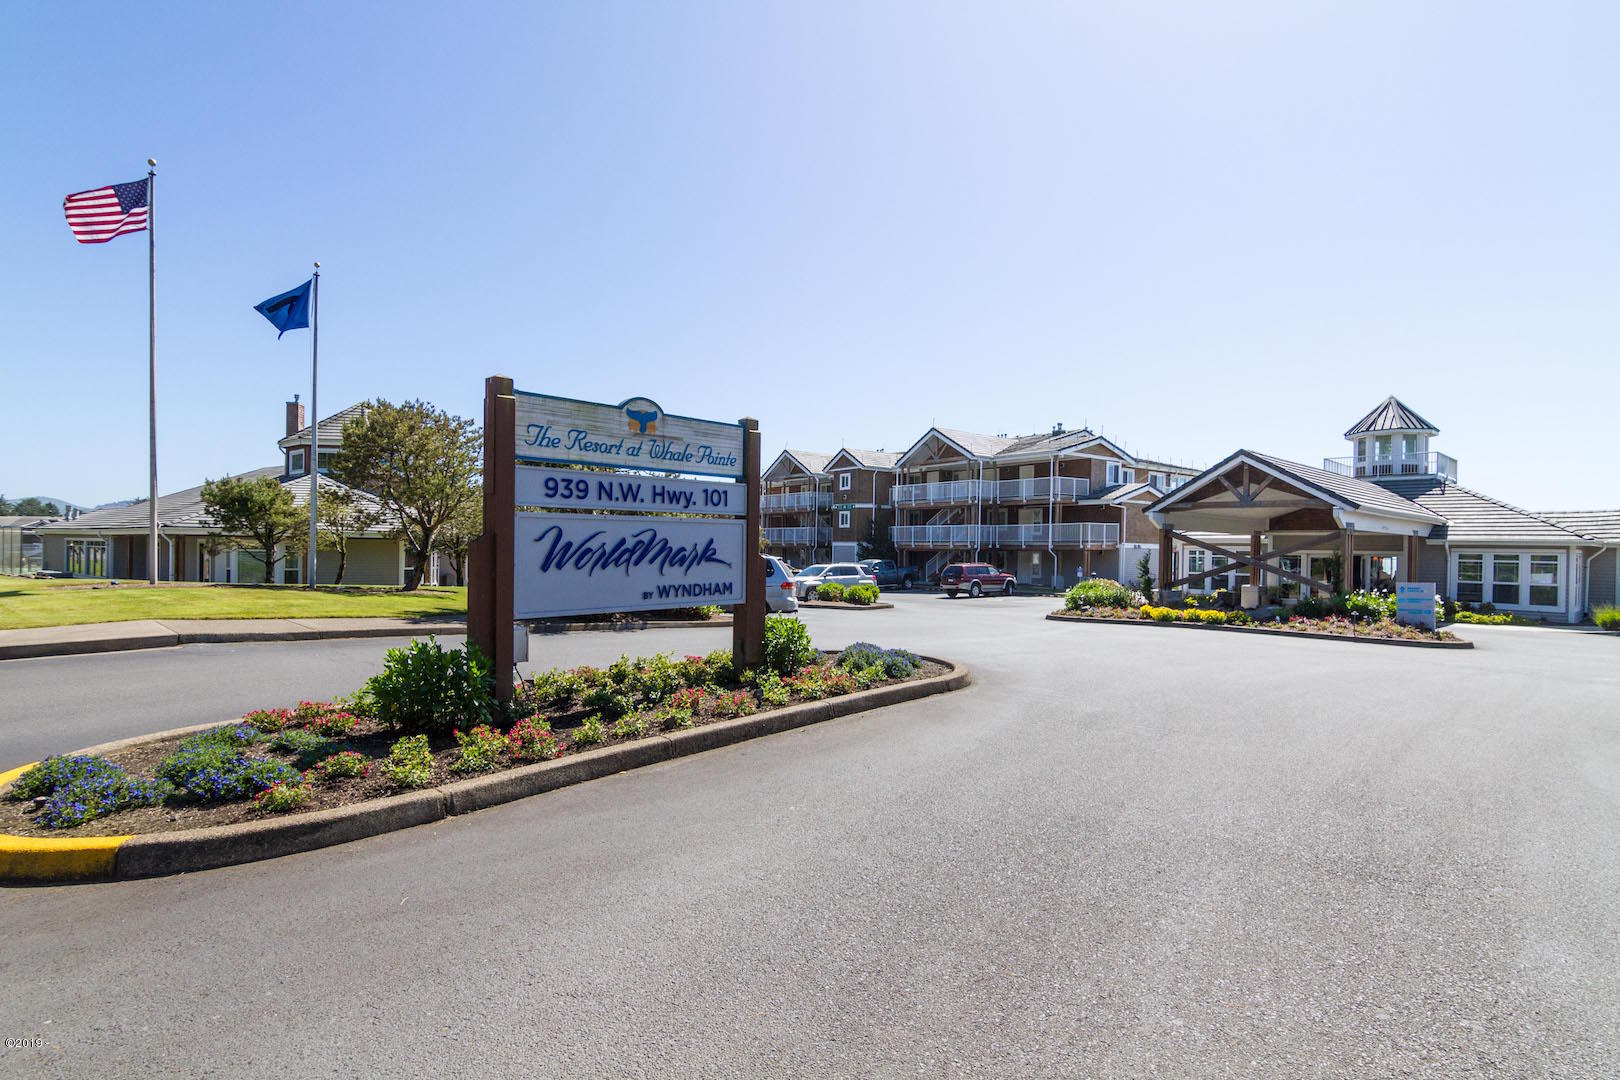 939 N Hwy 101, Unit 601 Week H, Depoe Bay, OR 97341 - Front entry sign at resort